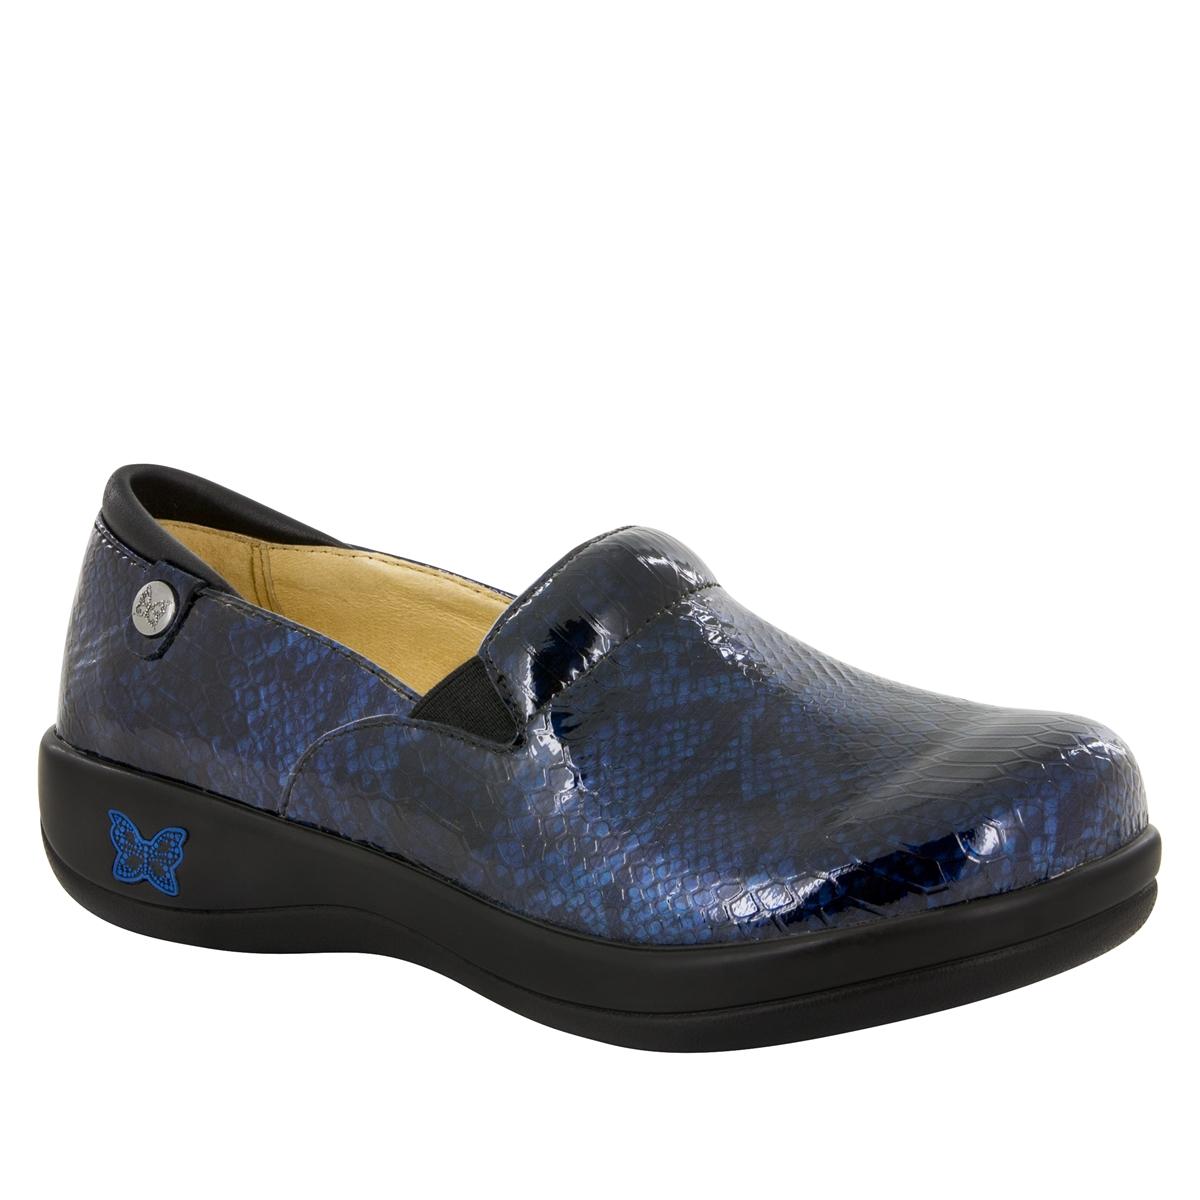 Alegria Shoes Keli Pro Sapphire Snake